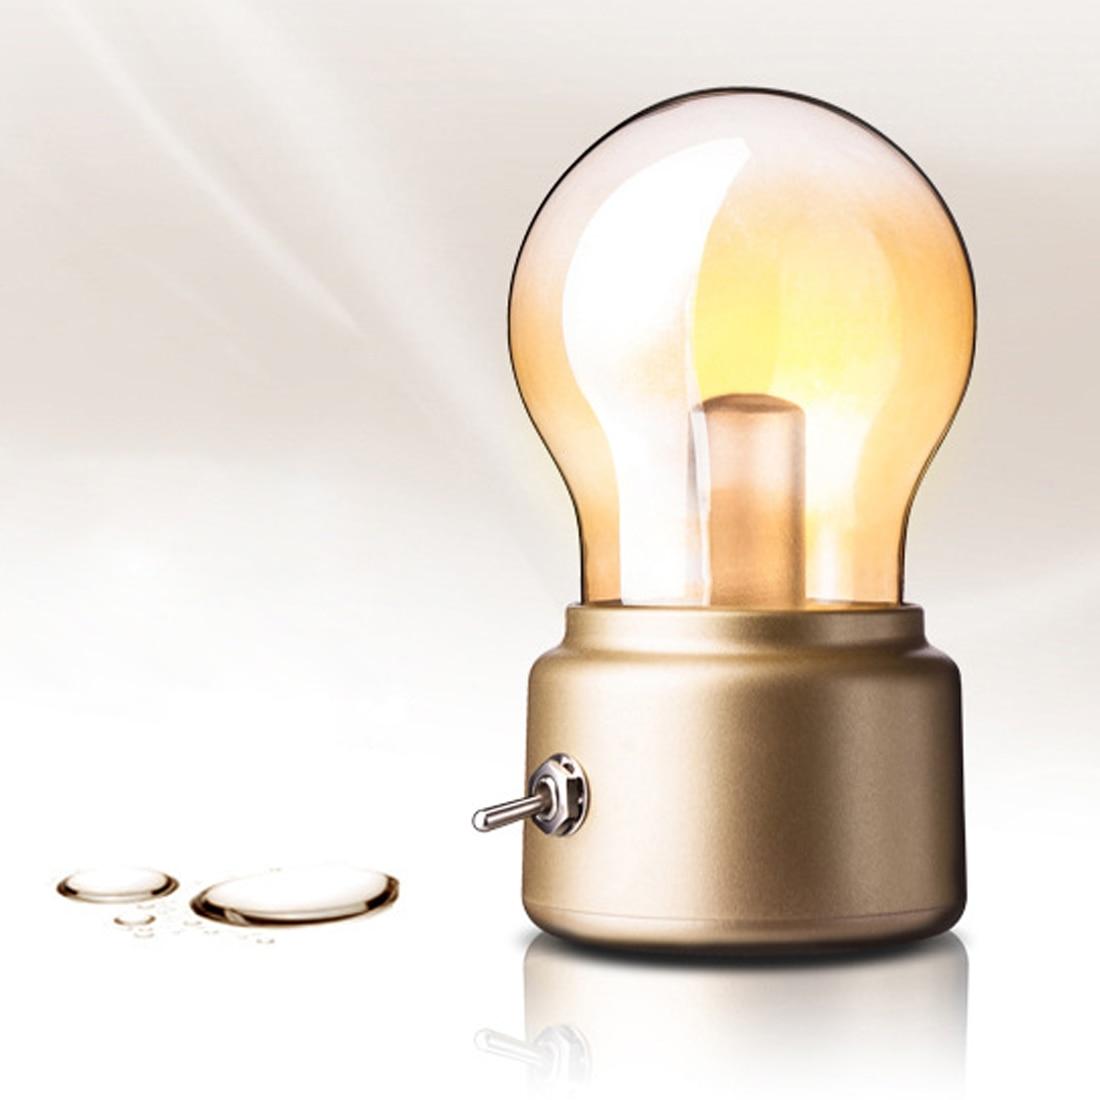 USB DC5V Rechargeable Battery Mood Luminaire Writing Desk Table Lights Vintage LED Bulb Night Light Retro Portable Bedside Lamp